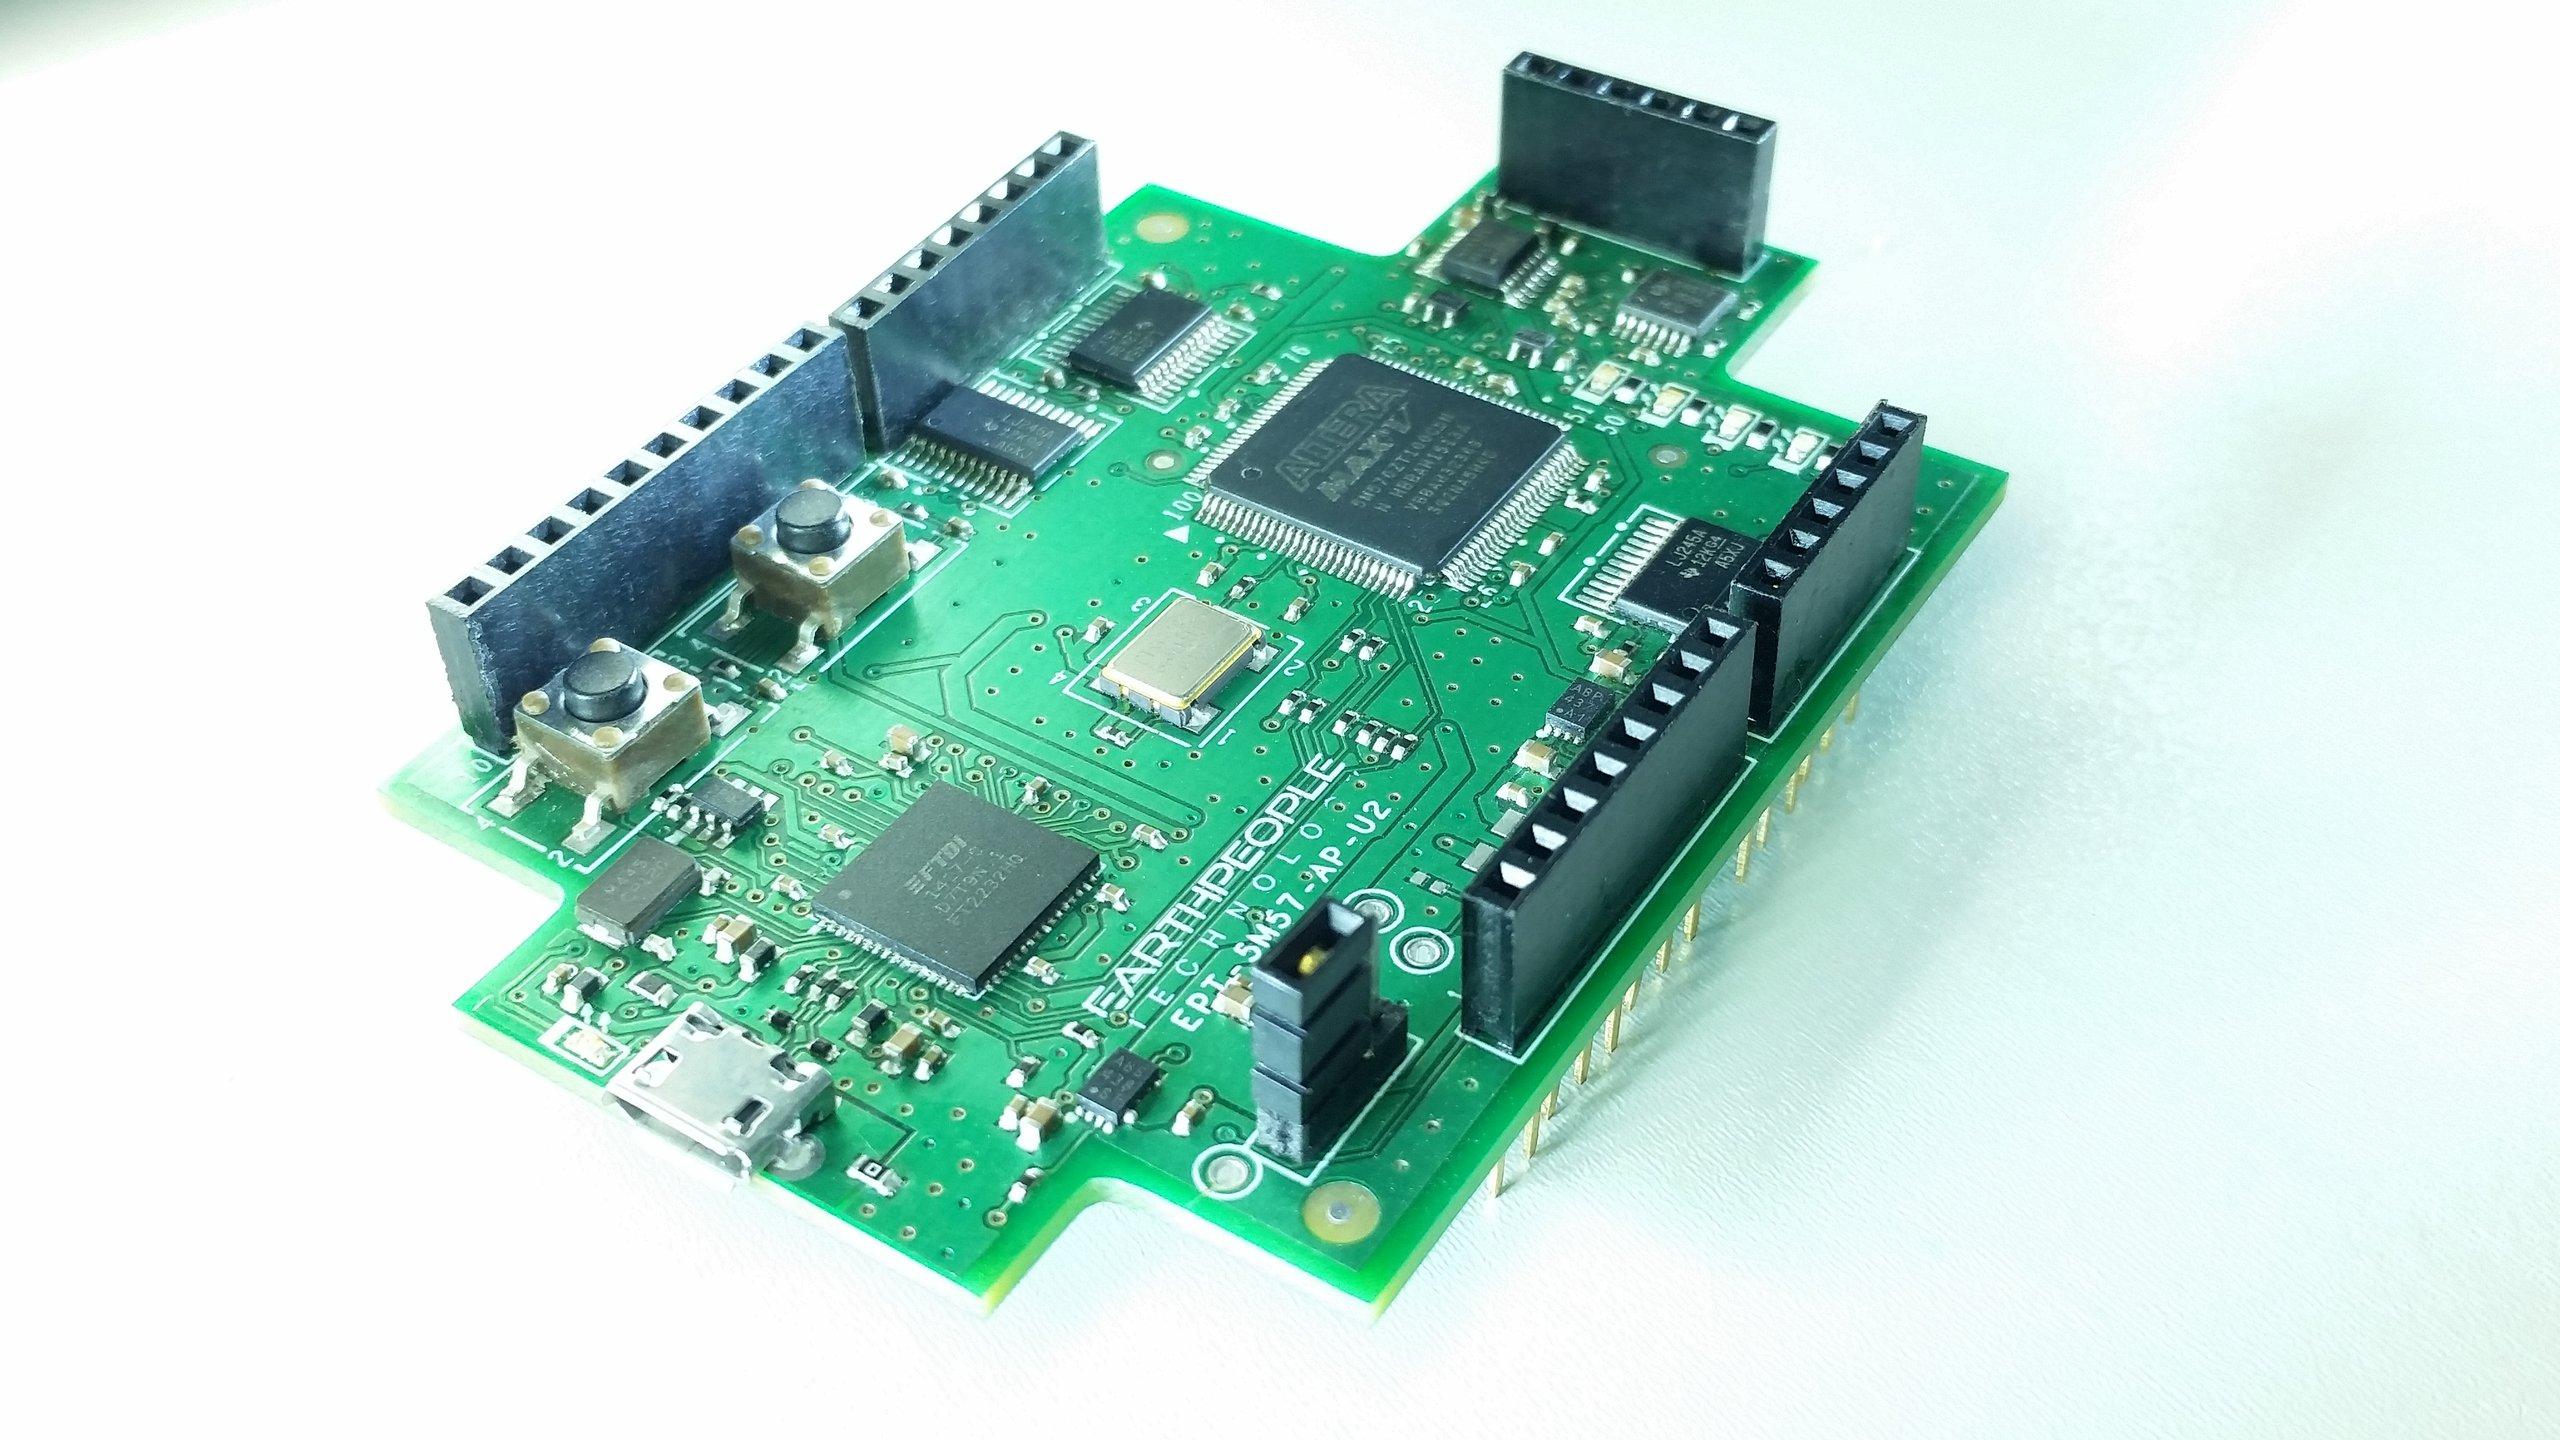 Arduino oscilloscope channel khz unoprolyzer from